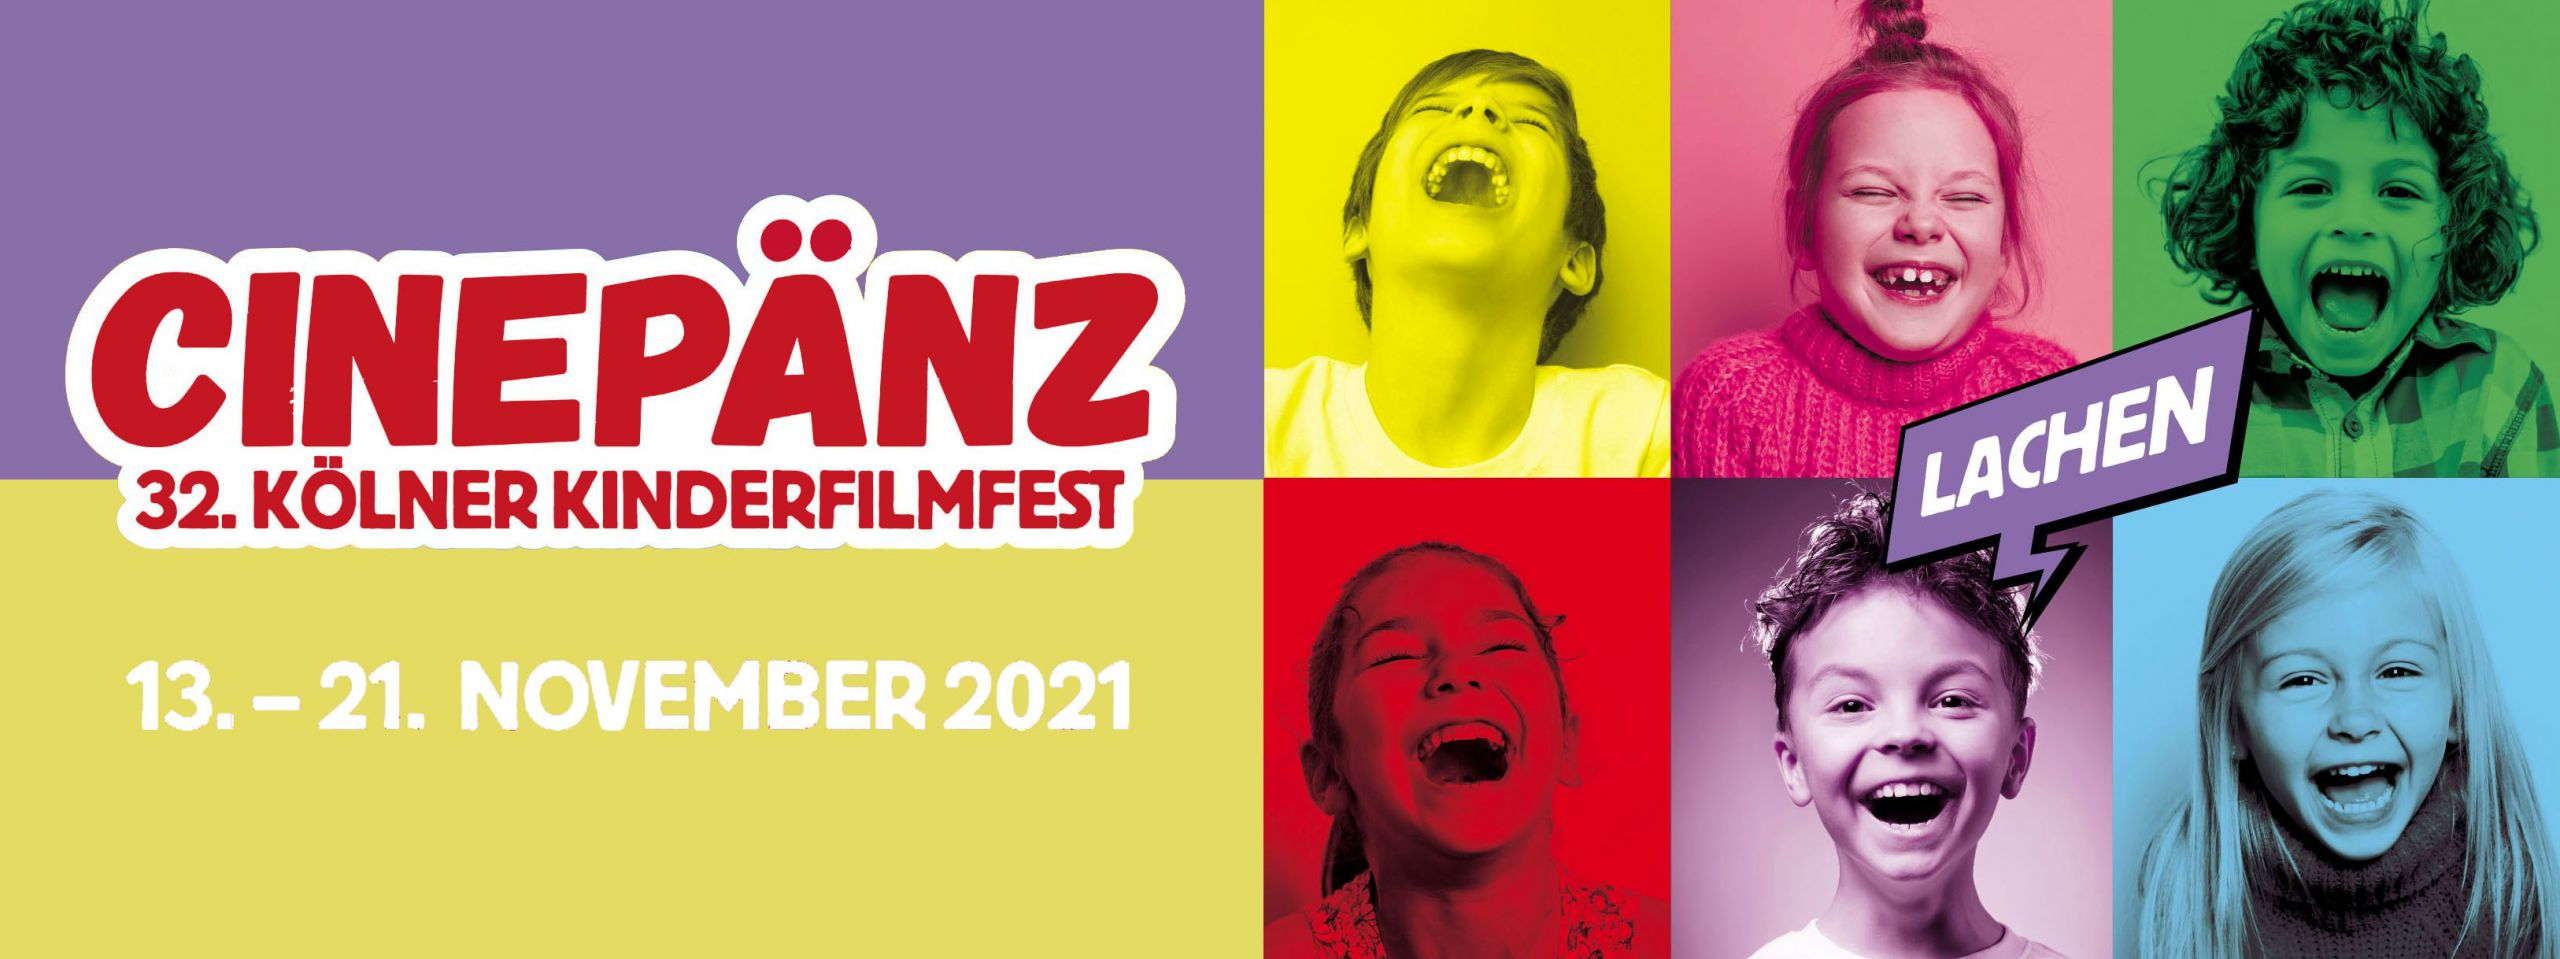 Cinepaenz 32 Kölner Kinderfilmfest